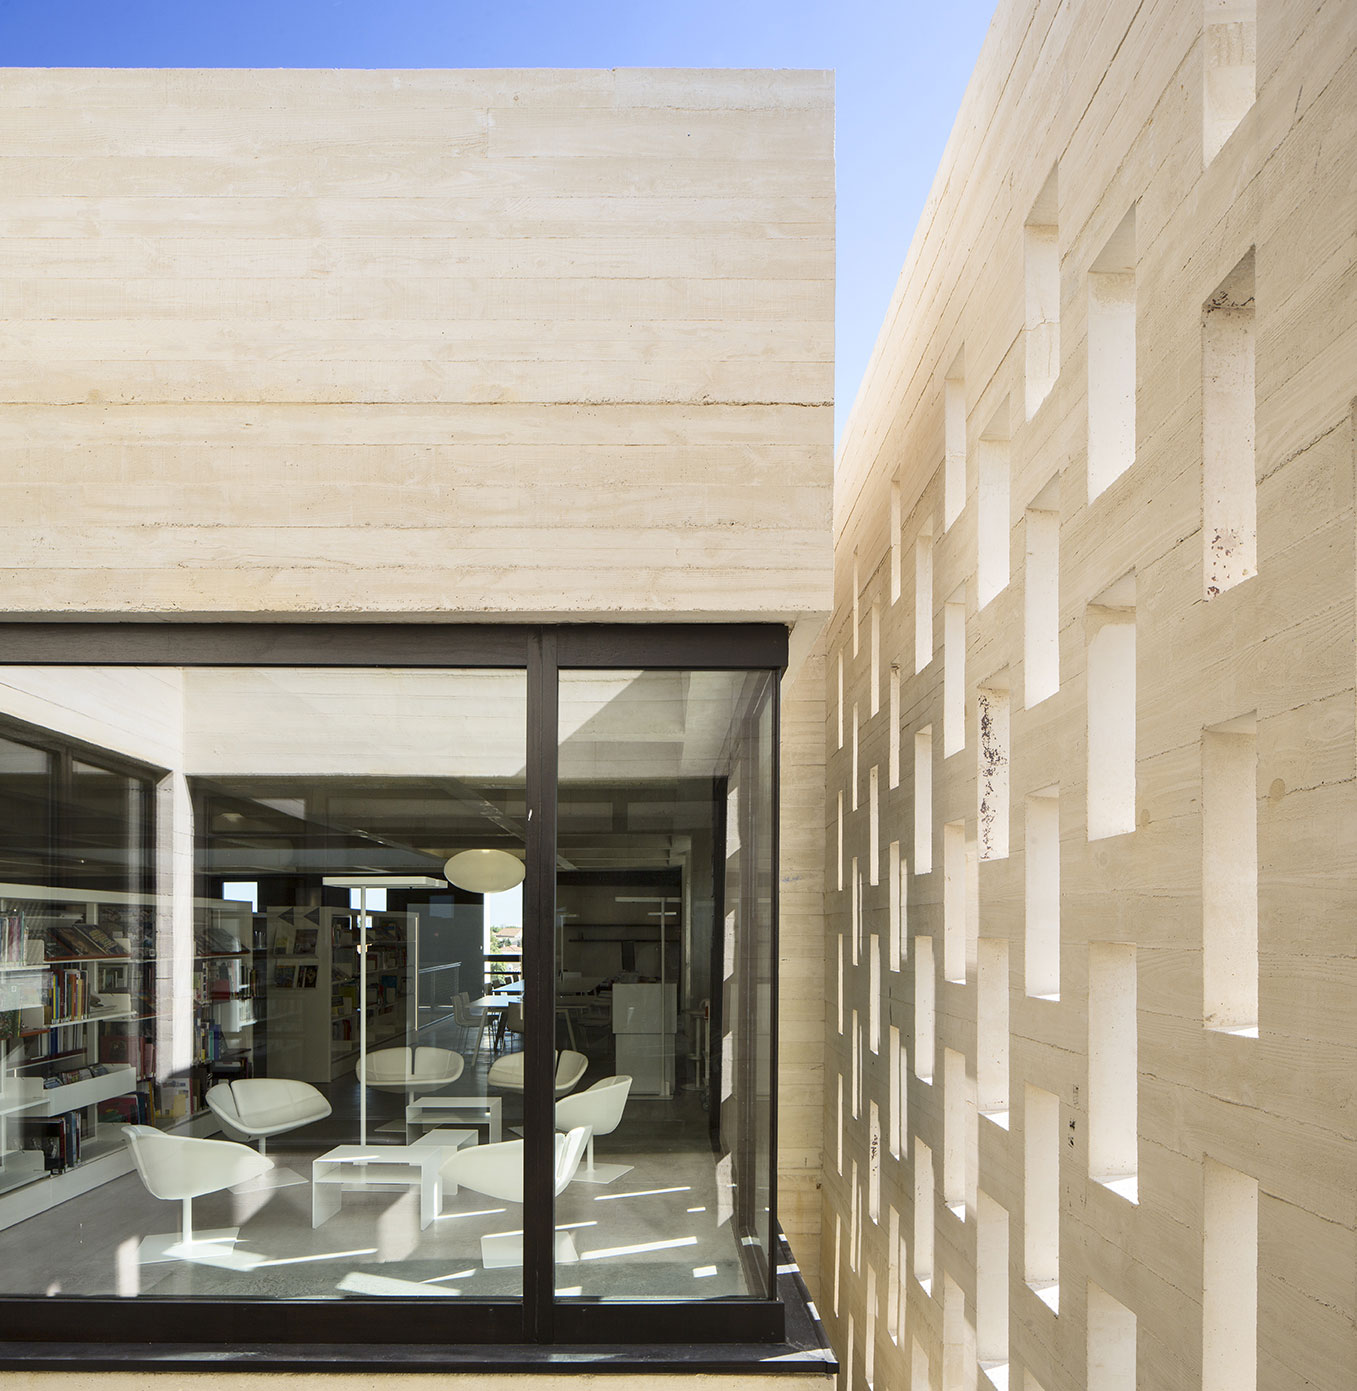 Tautem architecture - mediatheque Montaigne Frontignan - salon de lecture